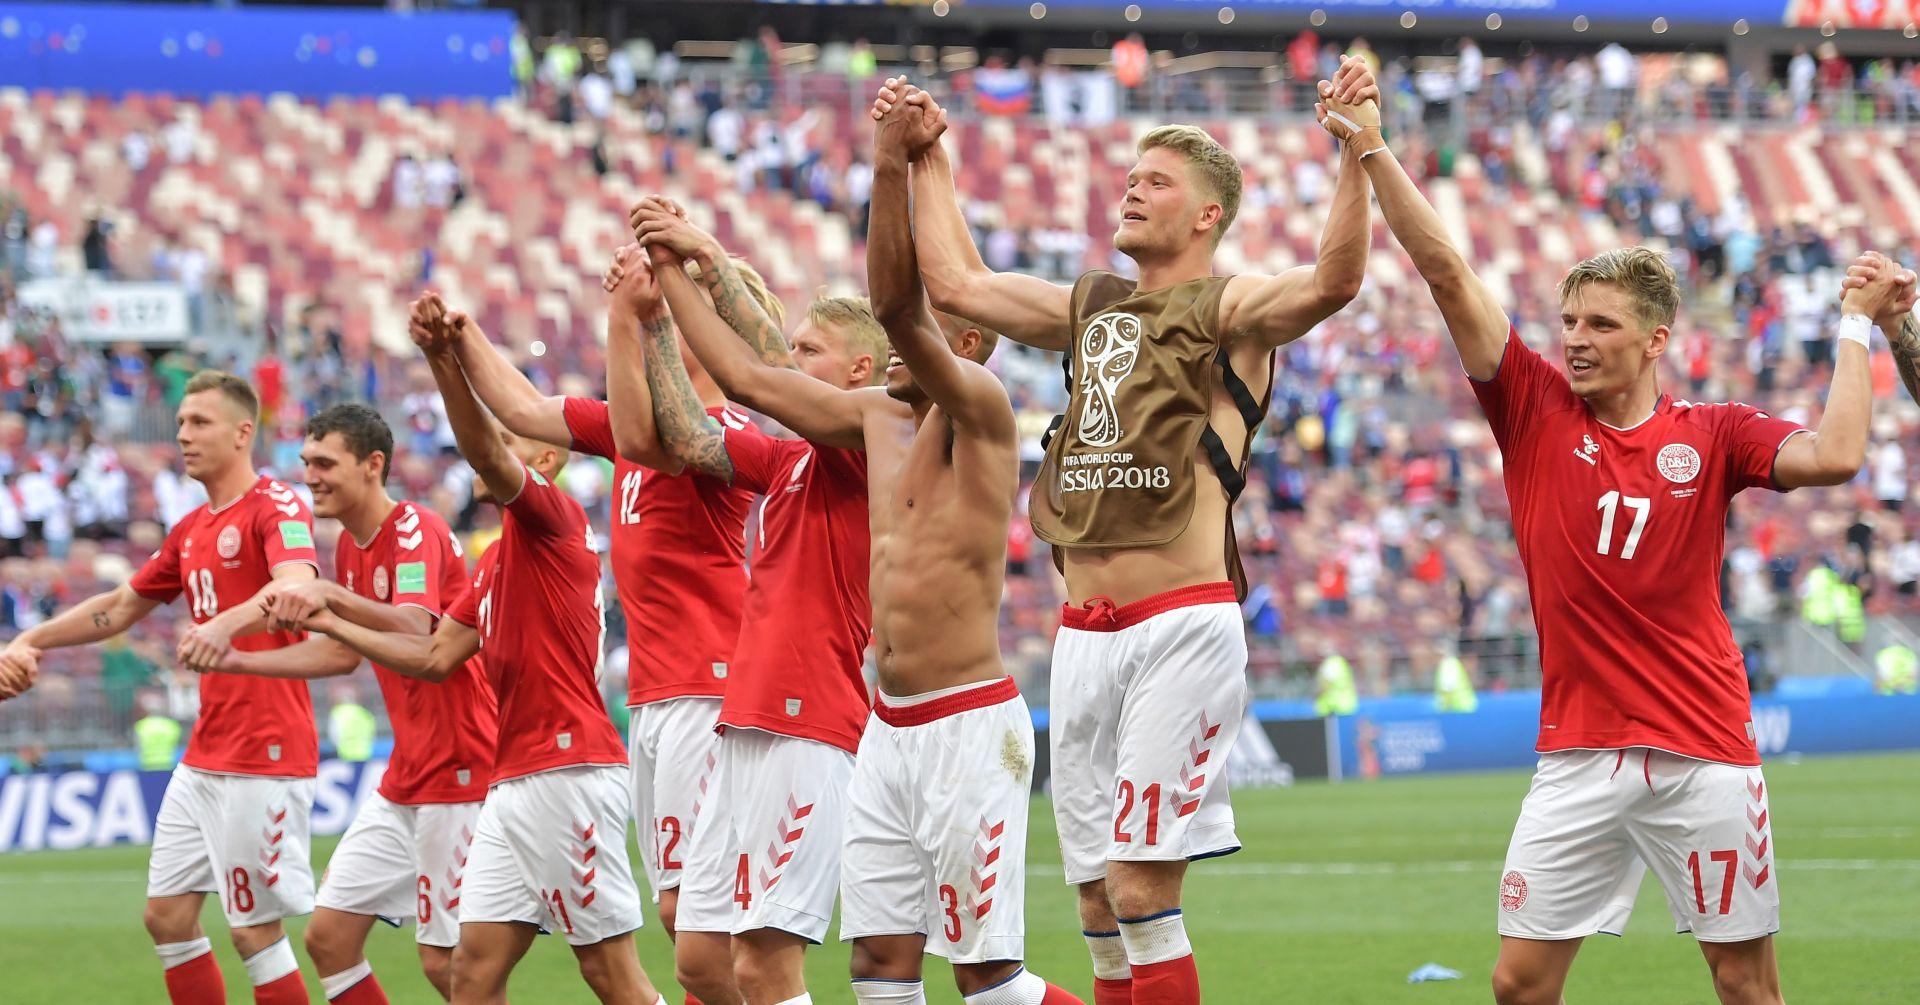 OPREZ, 'VATRENI' Danci bez poraza 18 utakmica